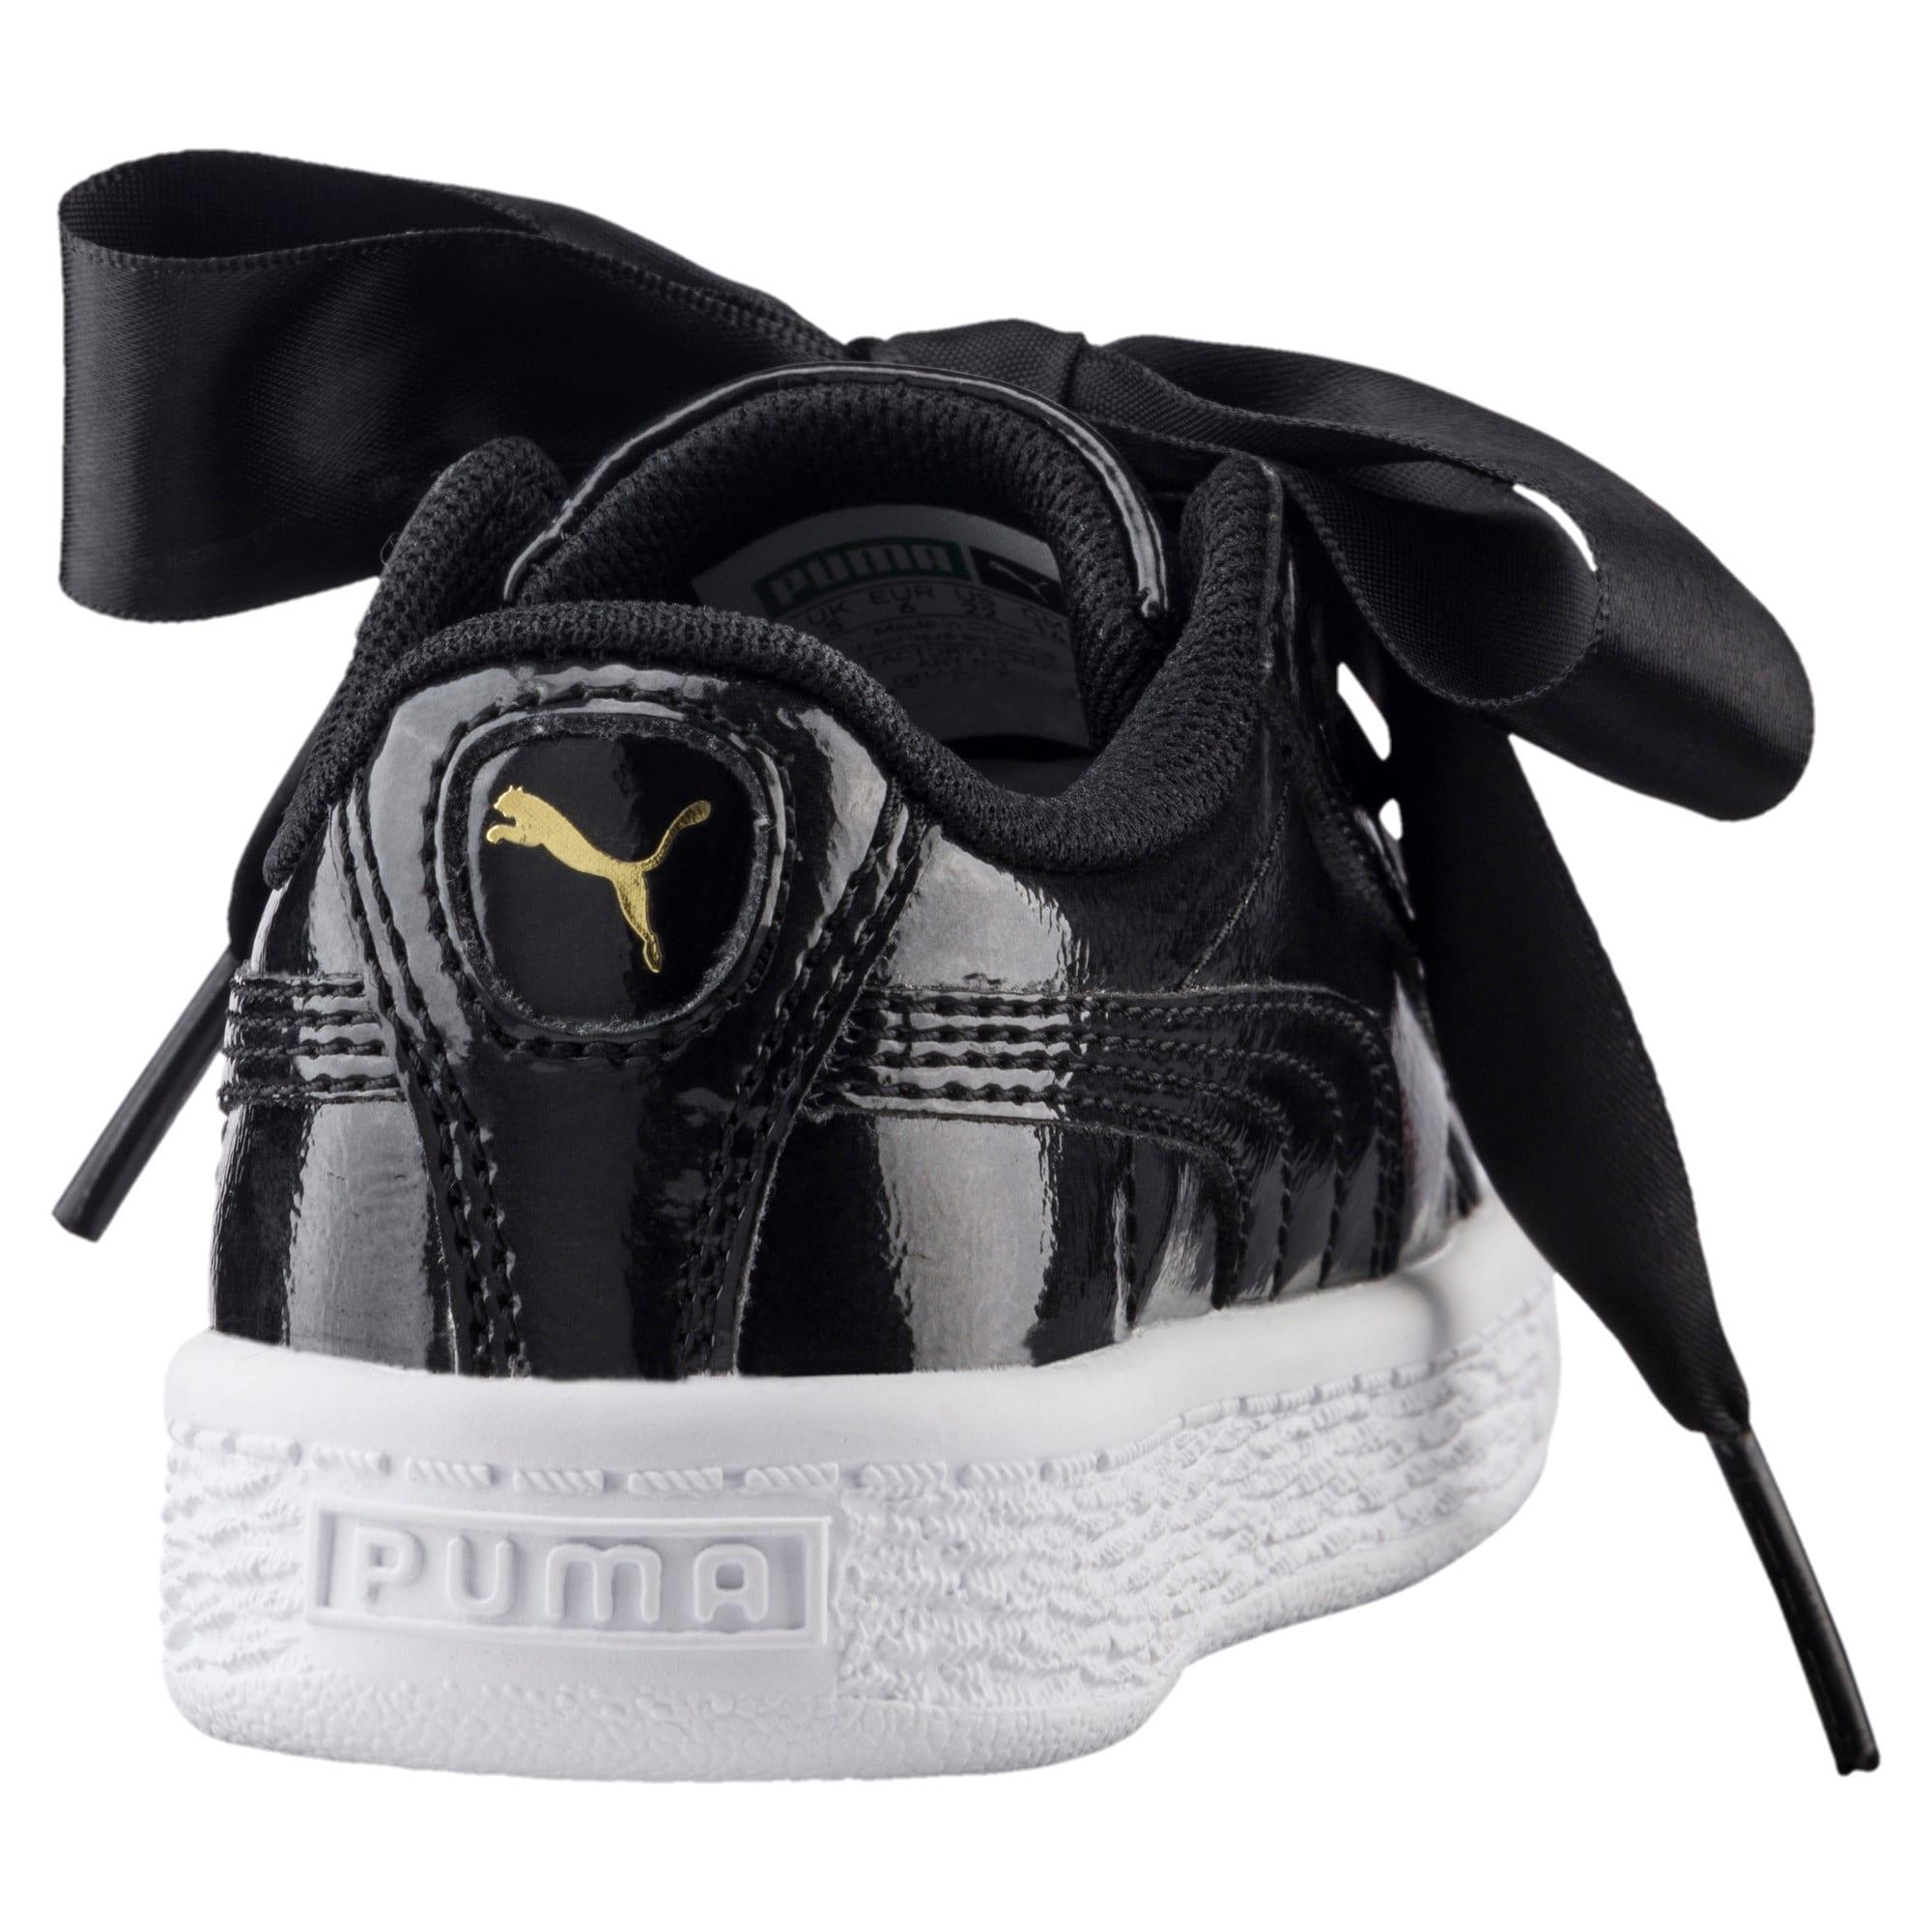 Thumbnail 4 of Basket Heart Glam Little Kids' Shoes, Puma Black-Puma Black, medium